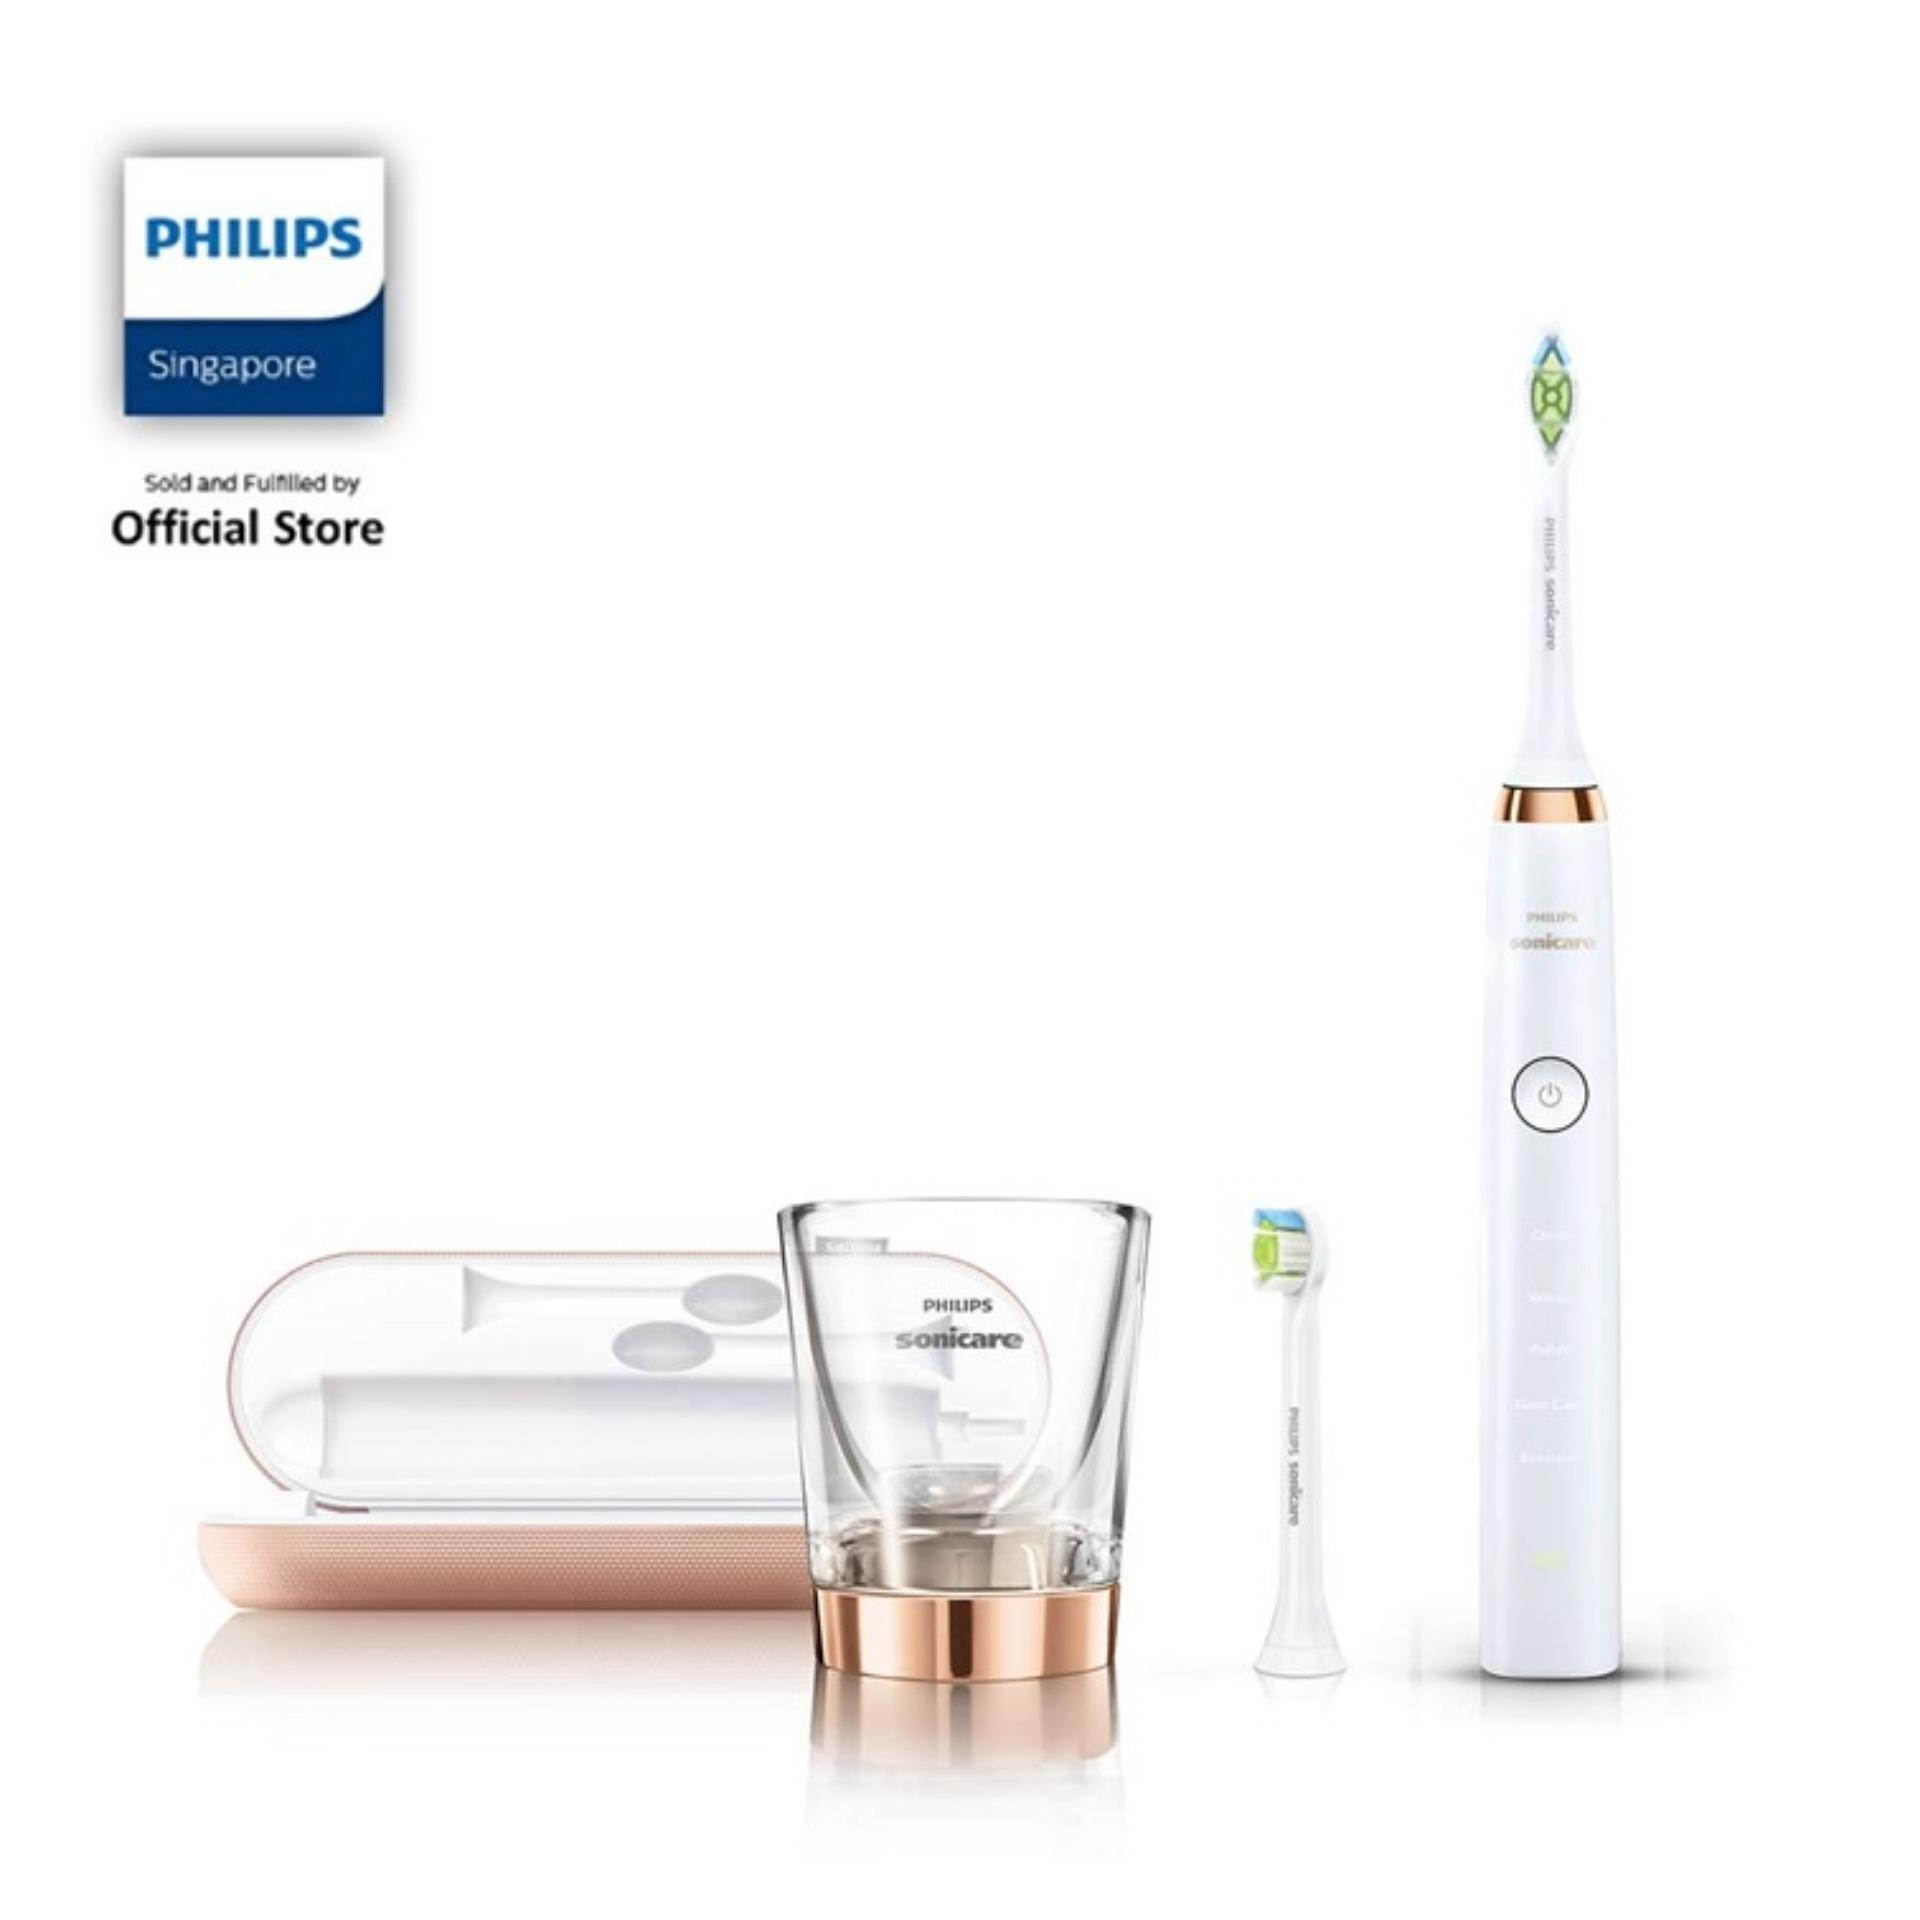 68e8ee80c86 Philips Sonicare DiamondClean Electric ToothBrush - HX9312/04